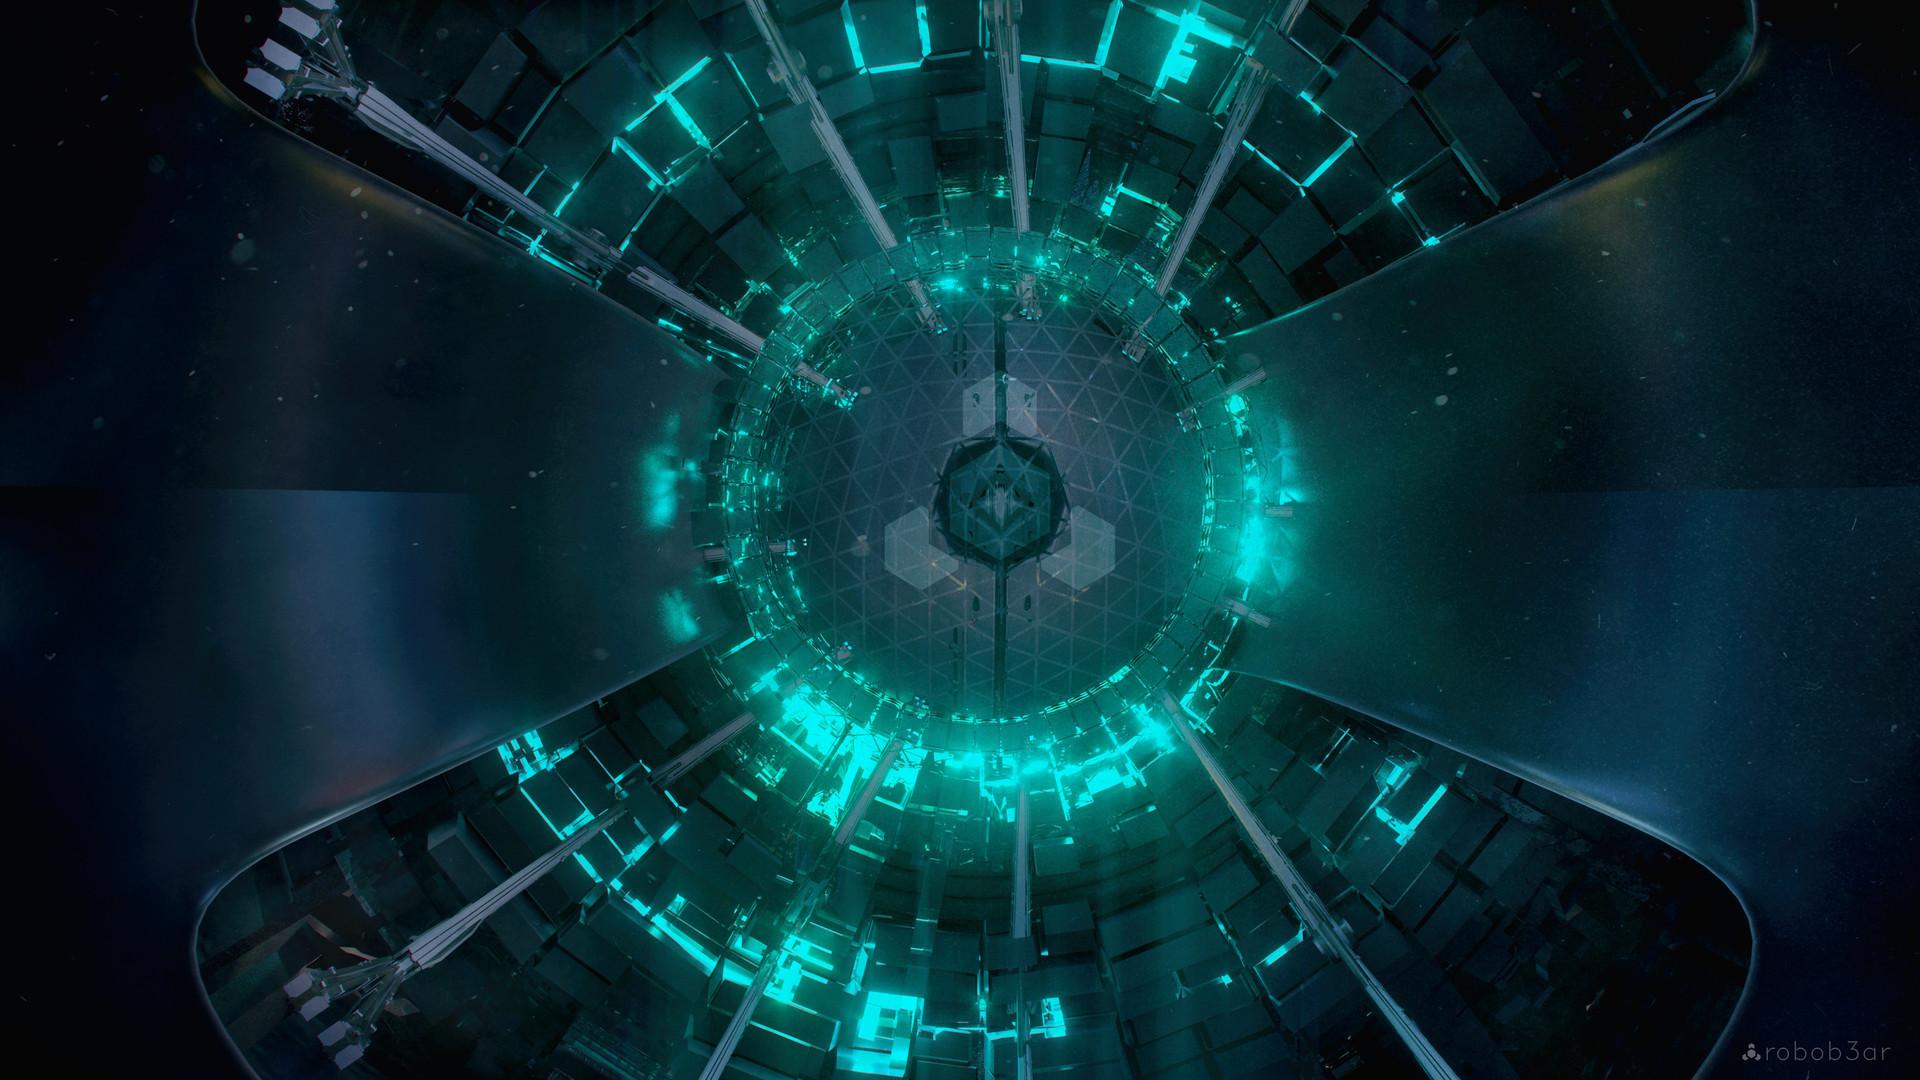 Kresimir jelusic robob3ar 433 201216 core ps